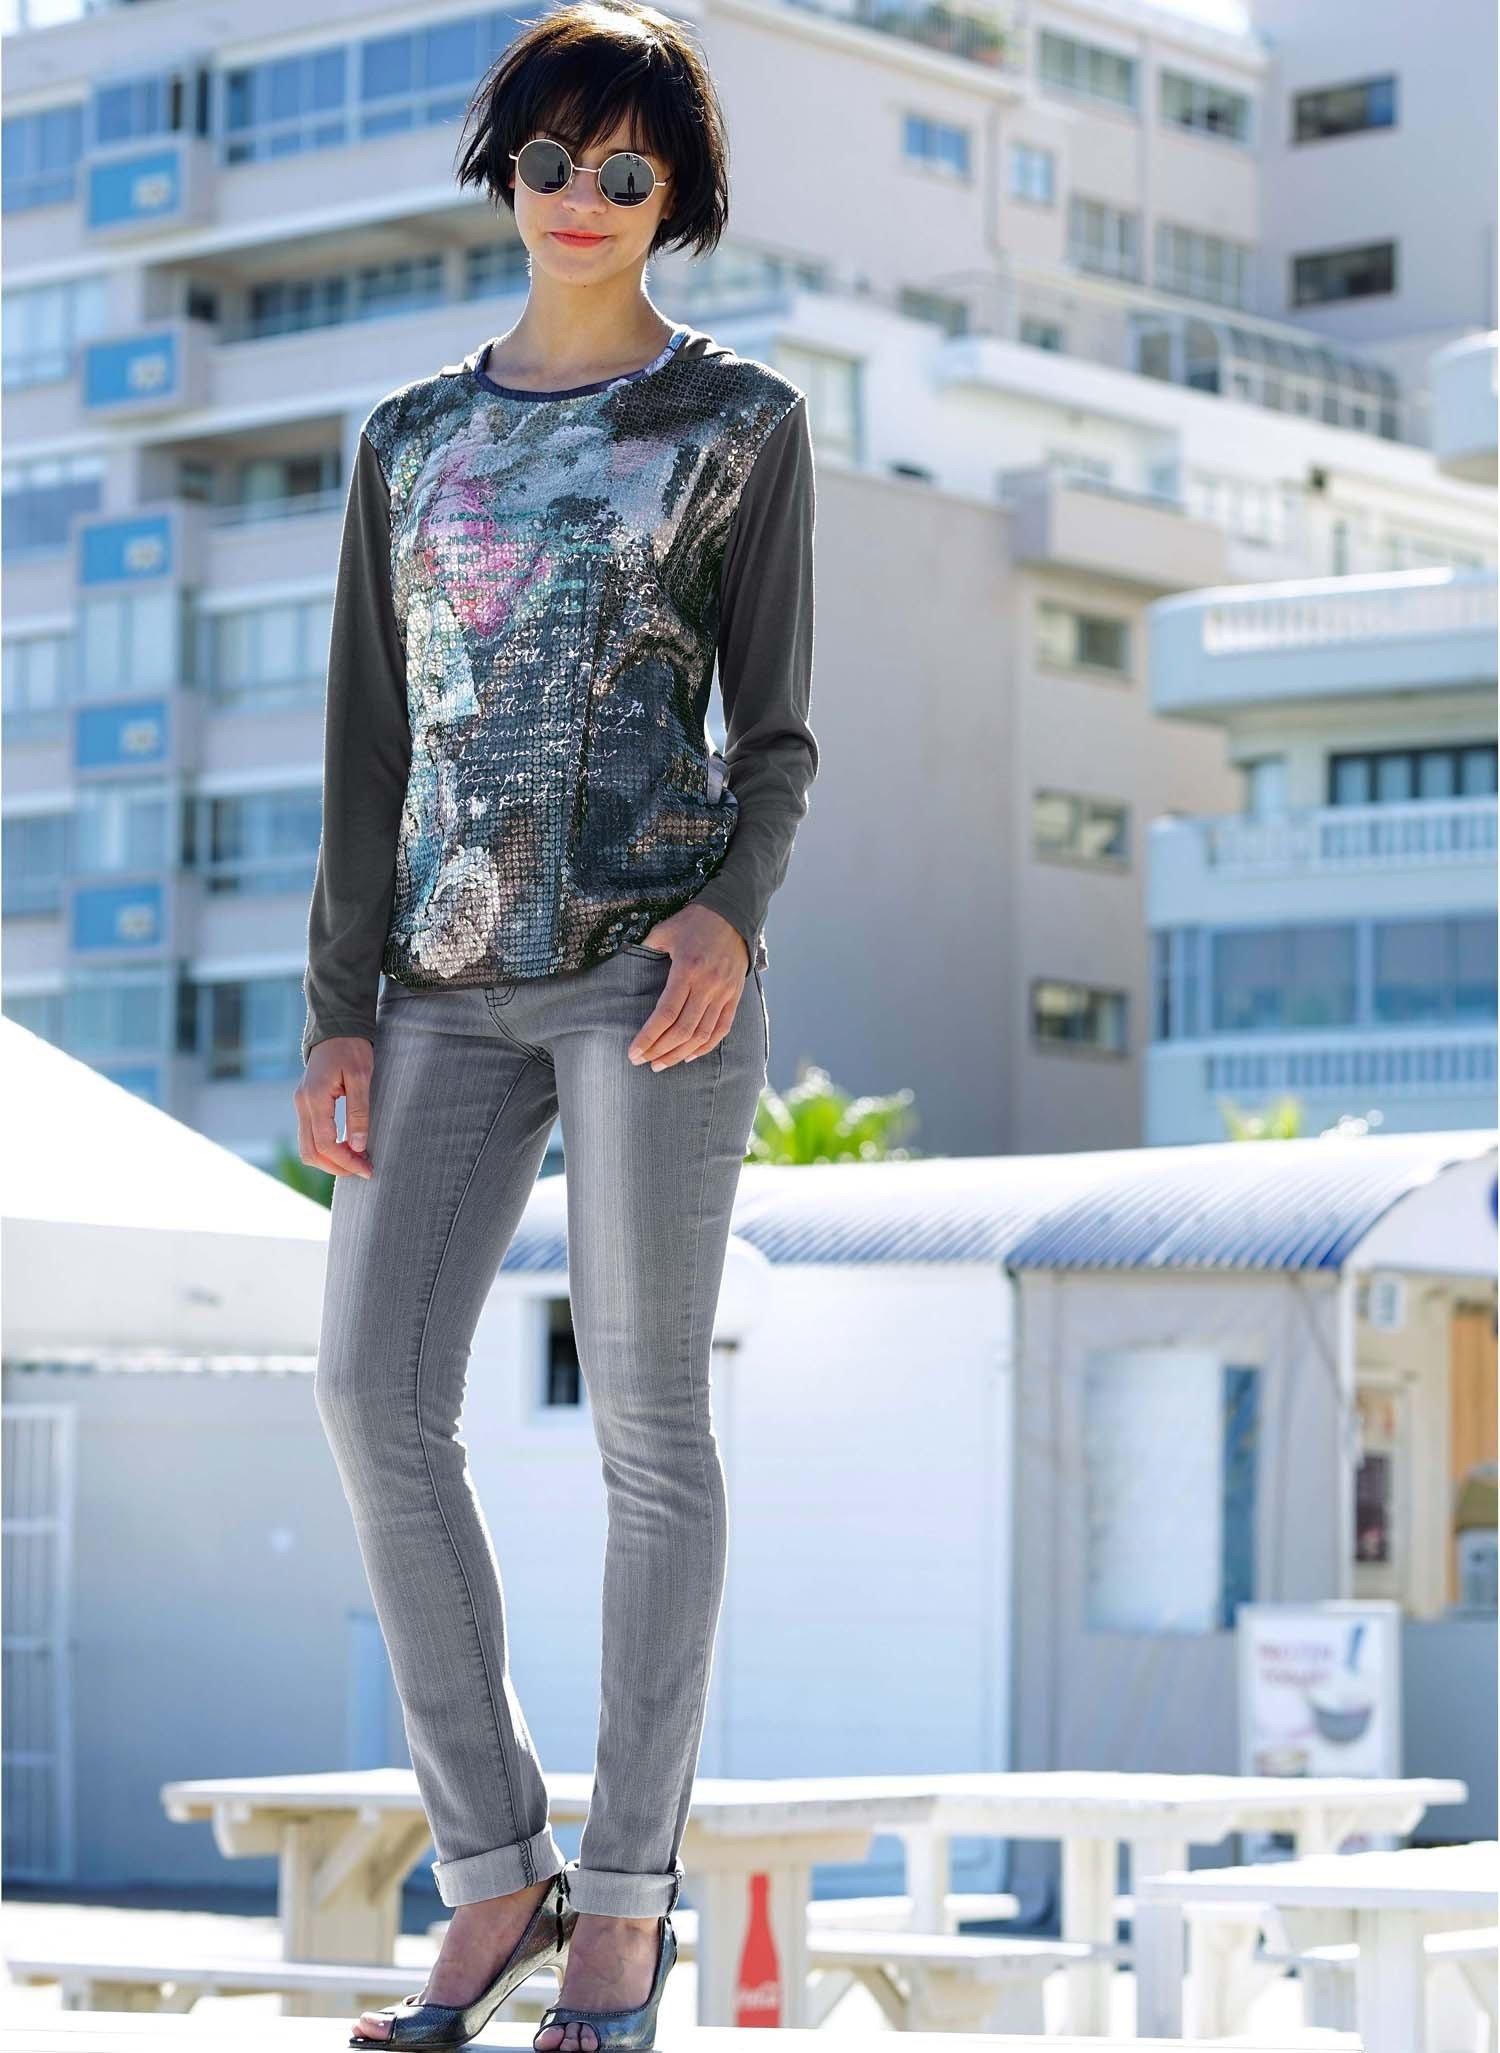 D-5-P-Jeans,Grey-Denim 34 005 - 1 - Ronja.ch